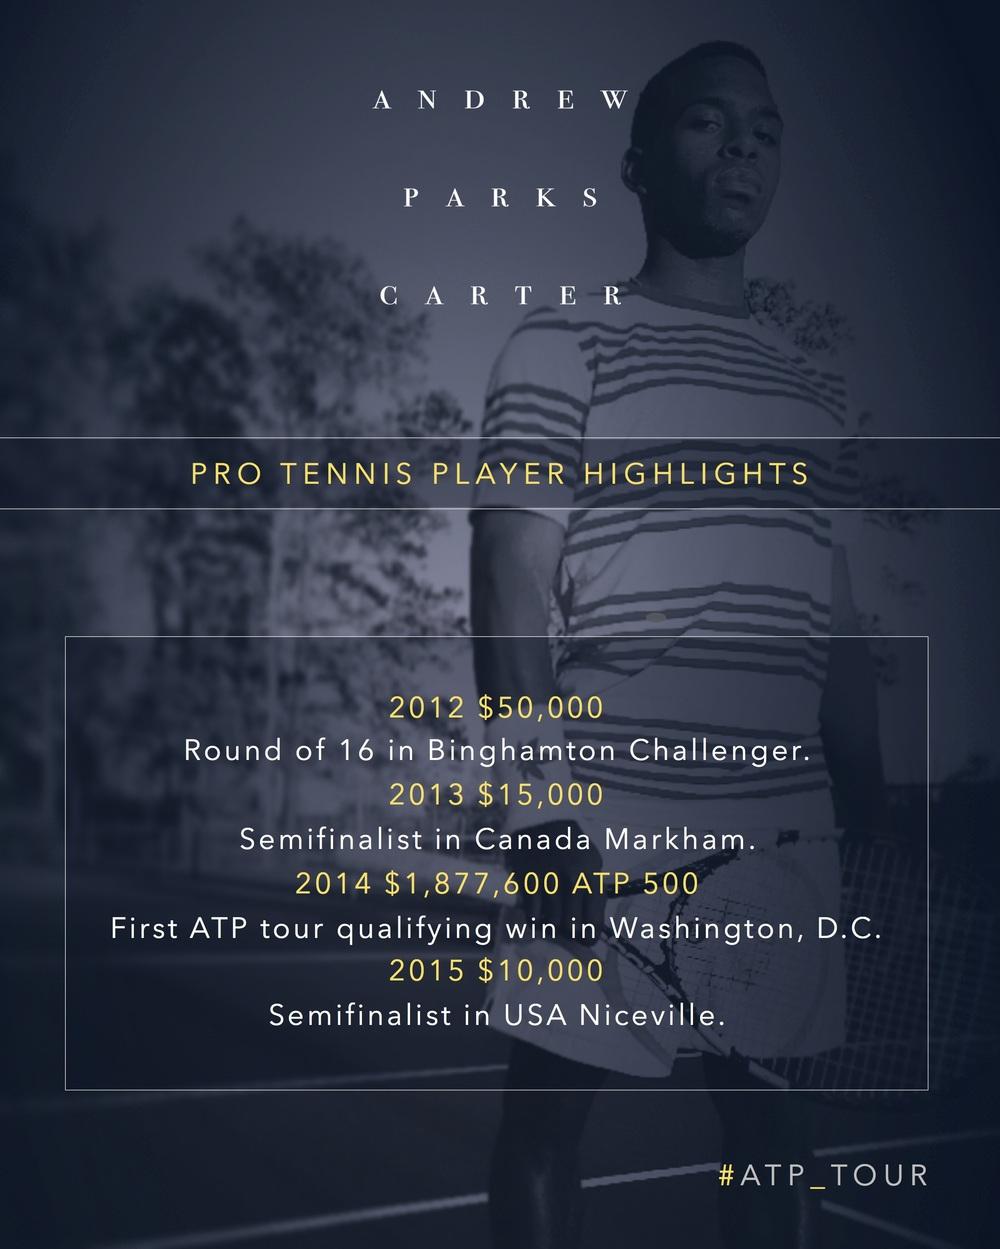 APC highlight card atp tour - Houston Tennis .jpg